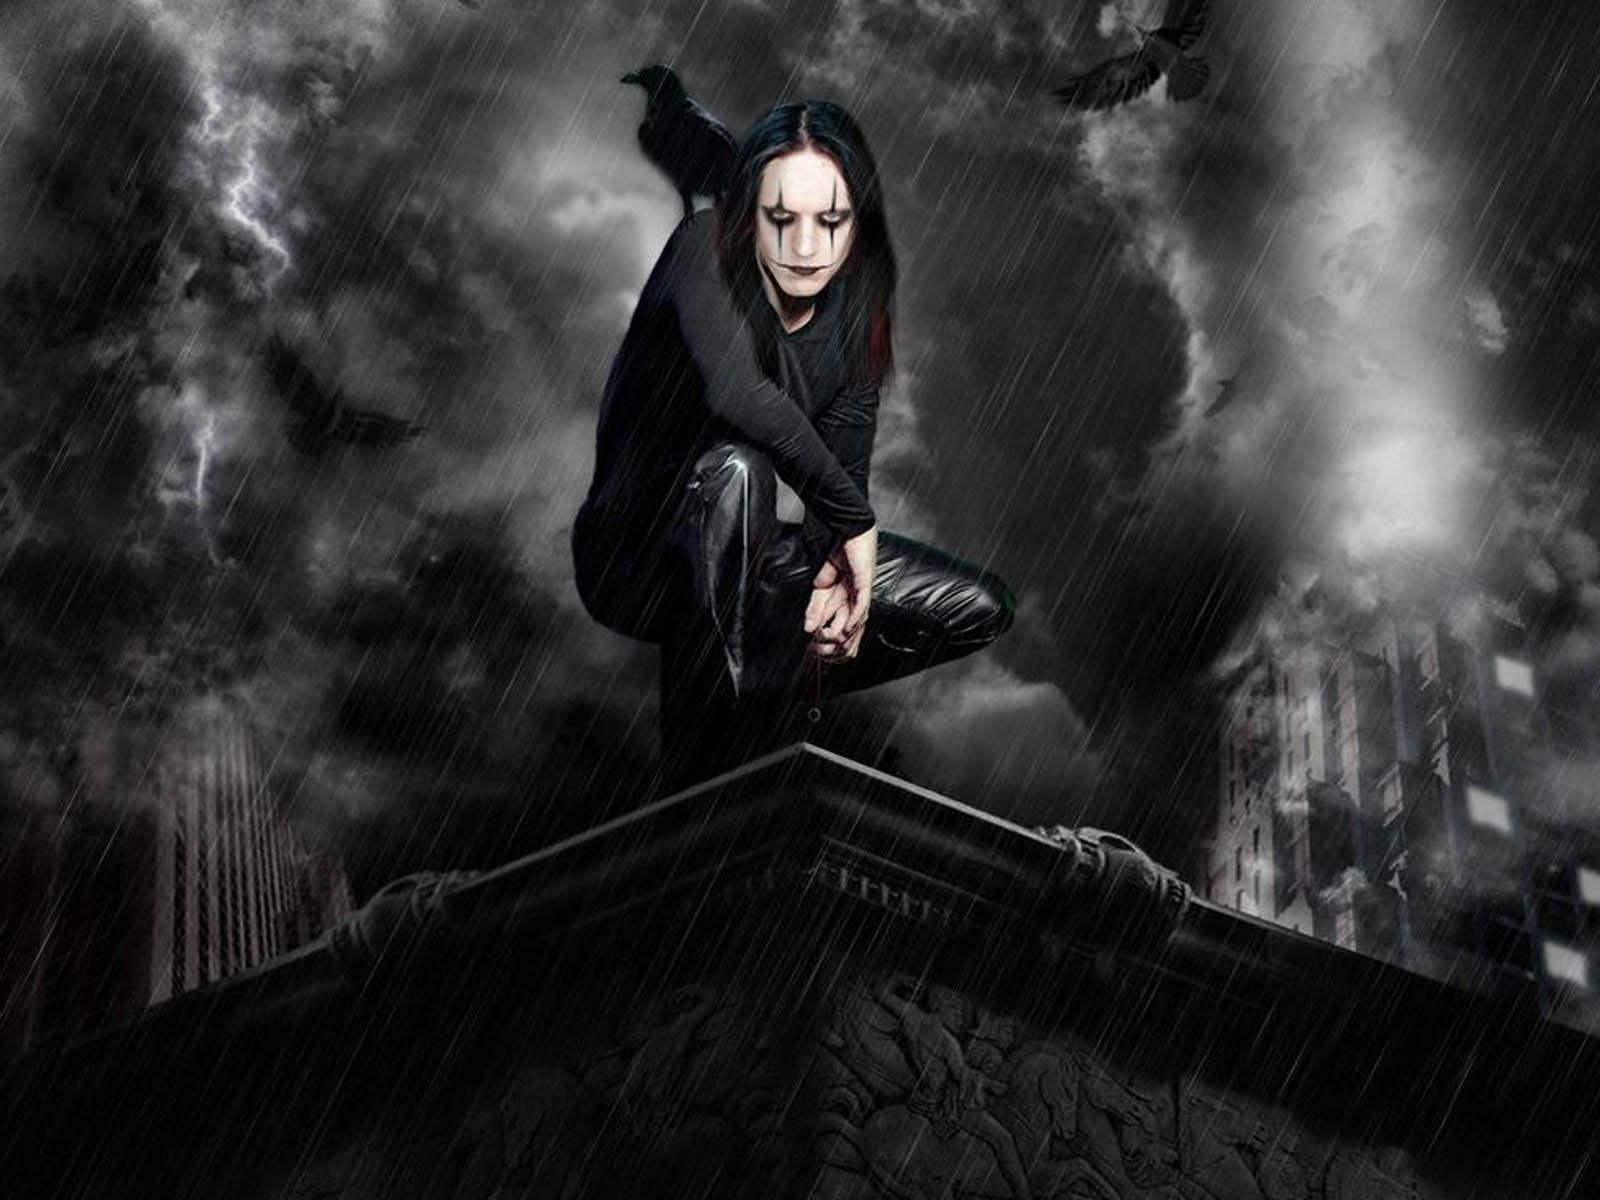 Dark Gothic Wallpapers 1600x1200